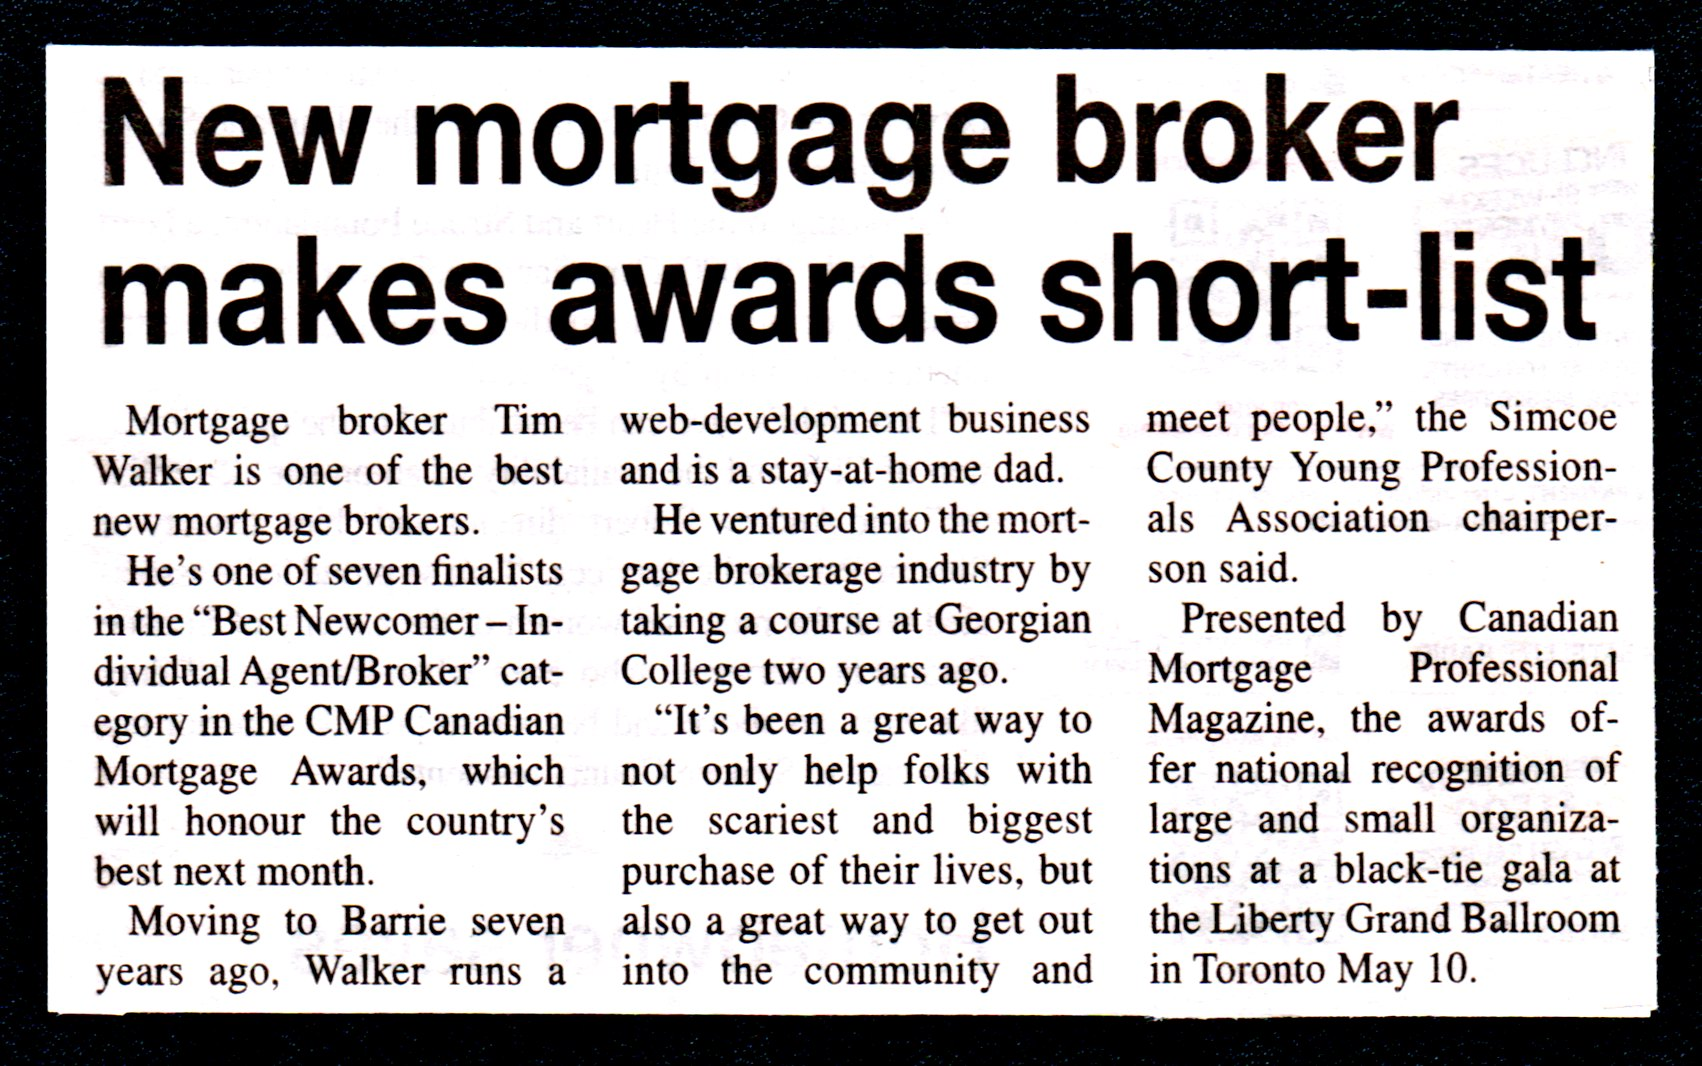 New Mortgage Broker Makes Awards Short-List